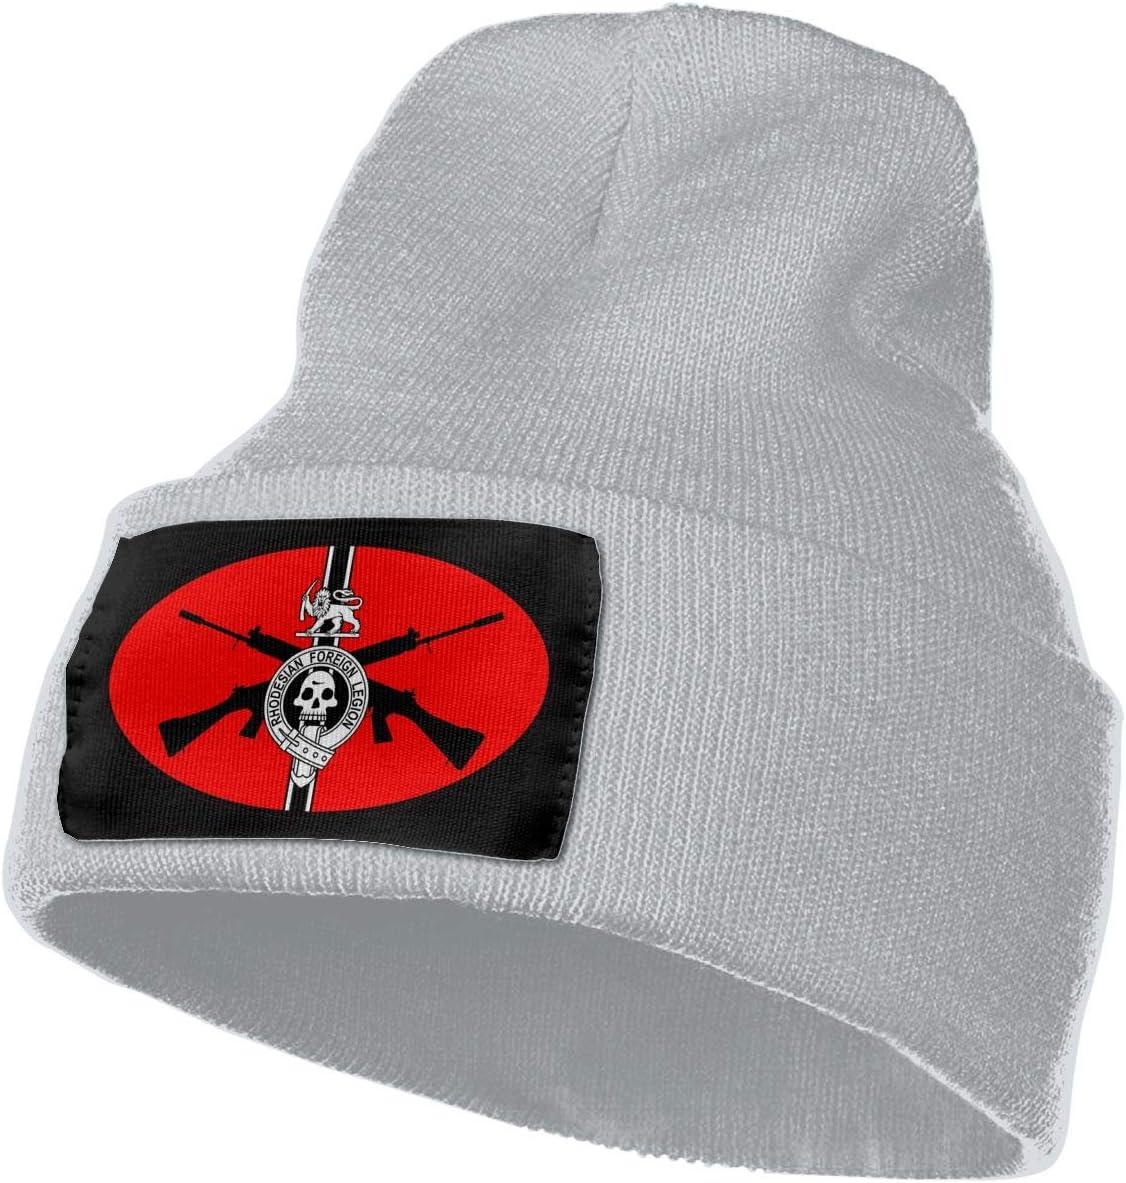 Rhodesian Foreign Legion Men/&Women Warm Winter Knit Plain Beanie Hat Skull Cap Acrylic Knit Cuff Hat